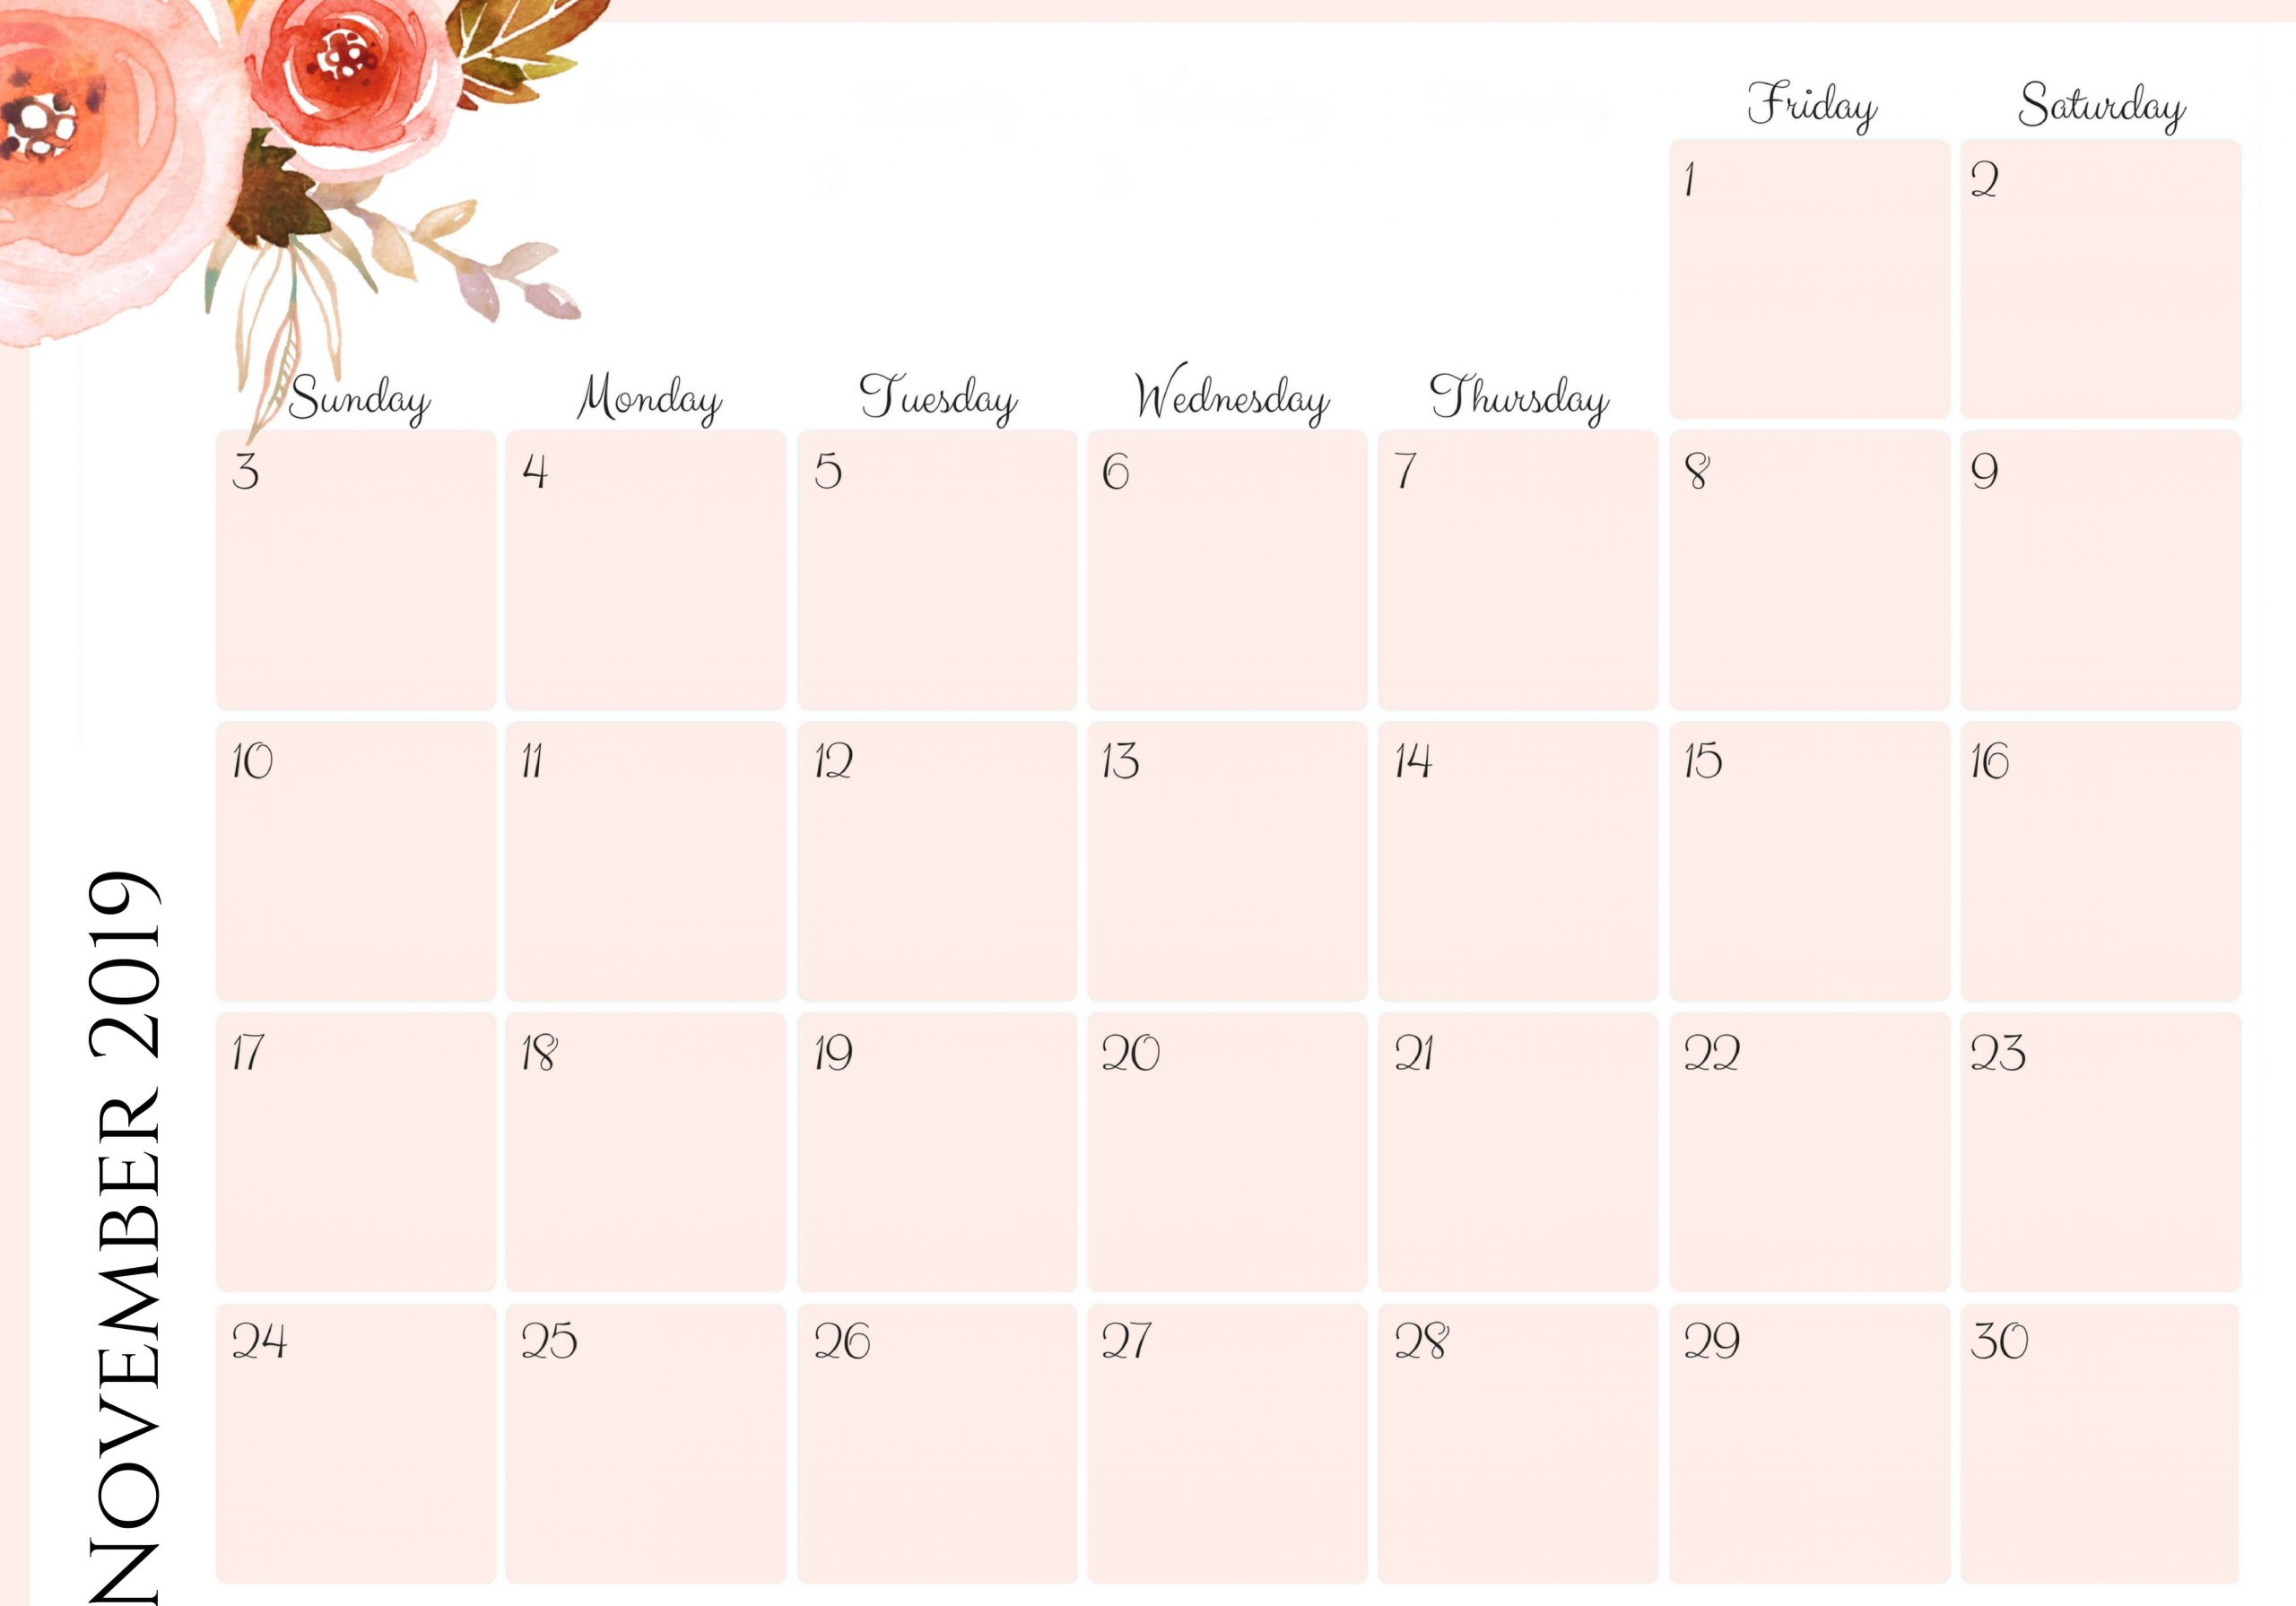 calendar template 2020 word  November 2019 Calendar Printable Monthly Datesheet ..